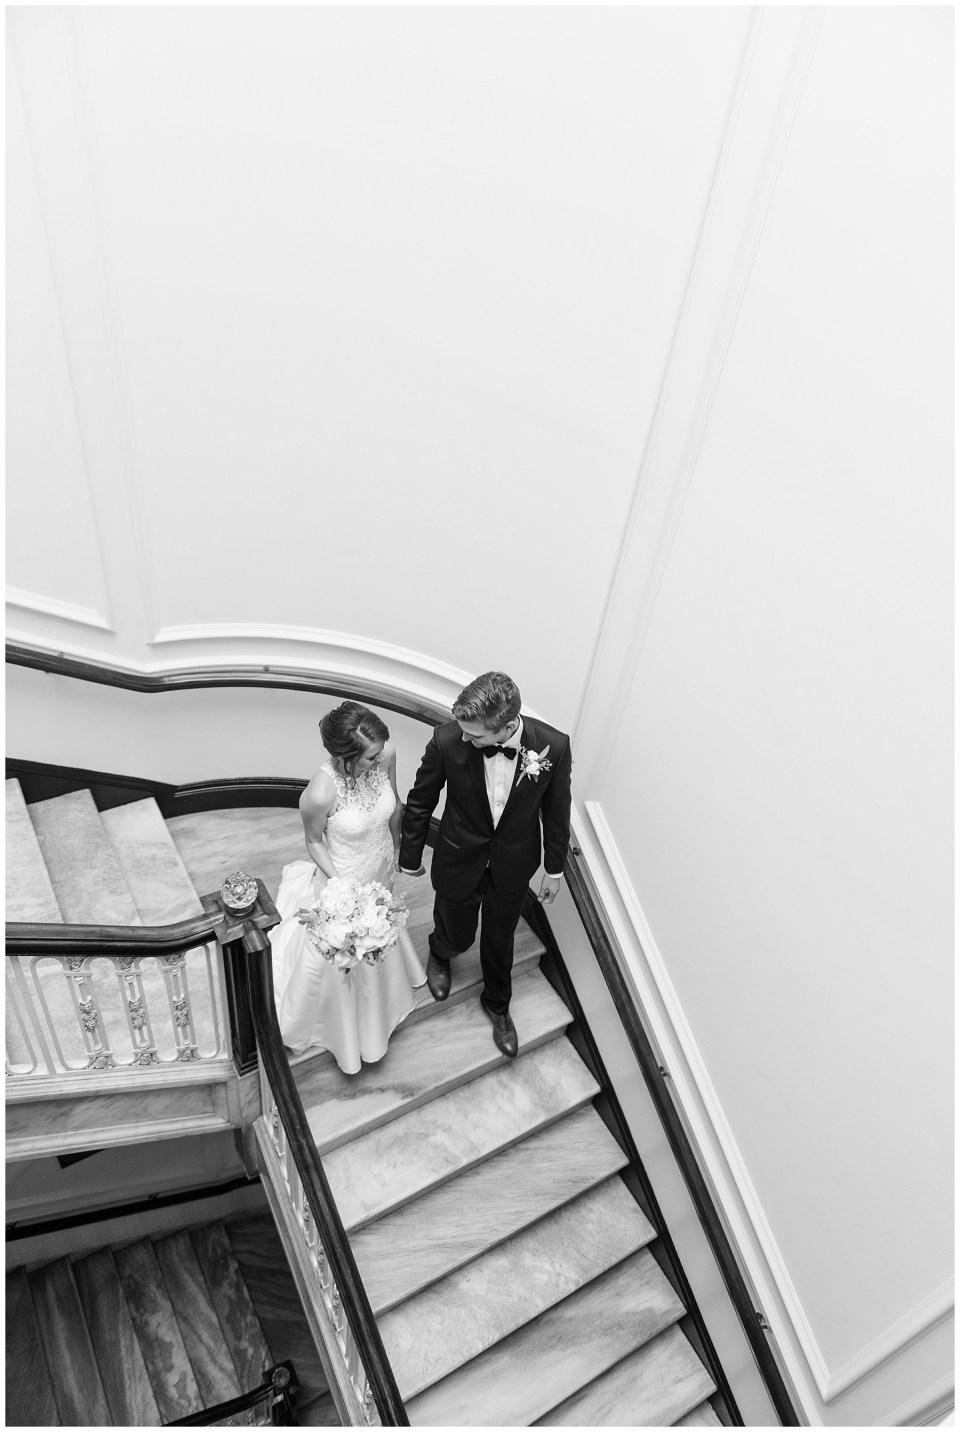 daughters-of-the-american-revolution-dar-dc-wedding-photos-dc-wedding-photographer-fall-wedding-photo-53_photos.jpg